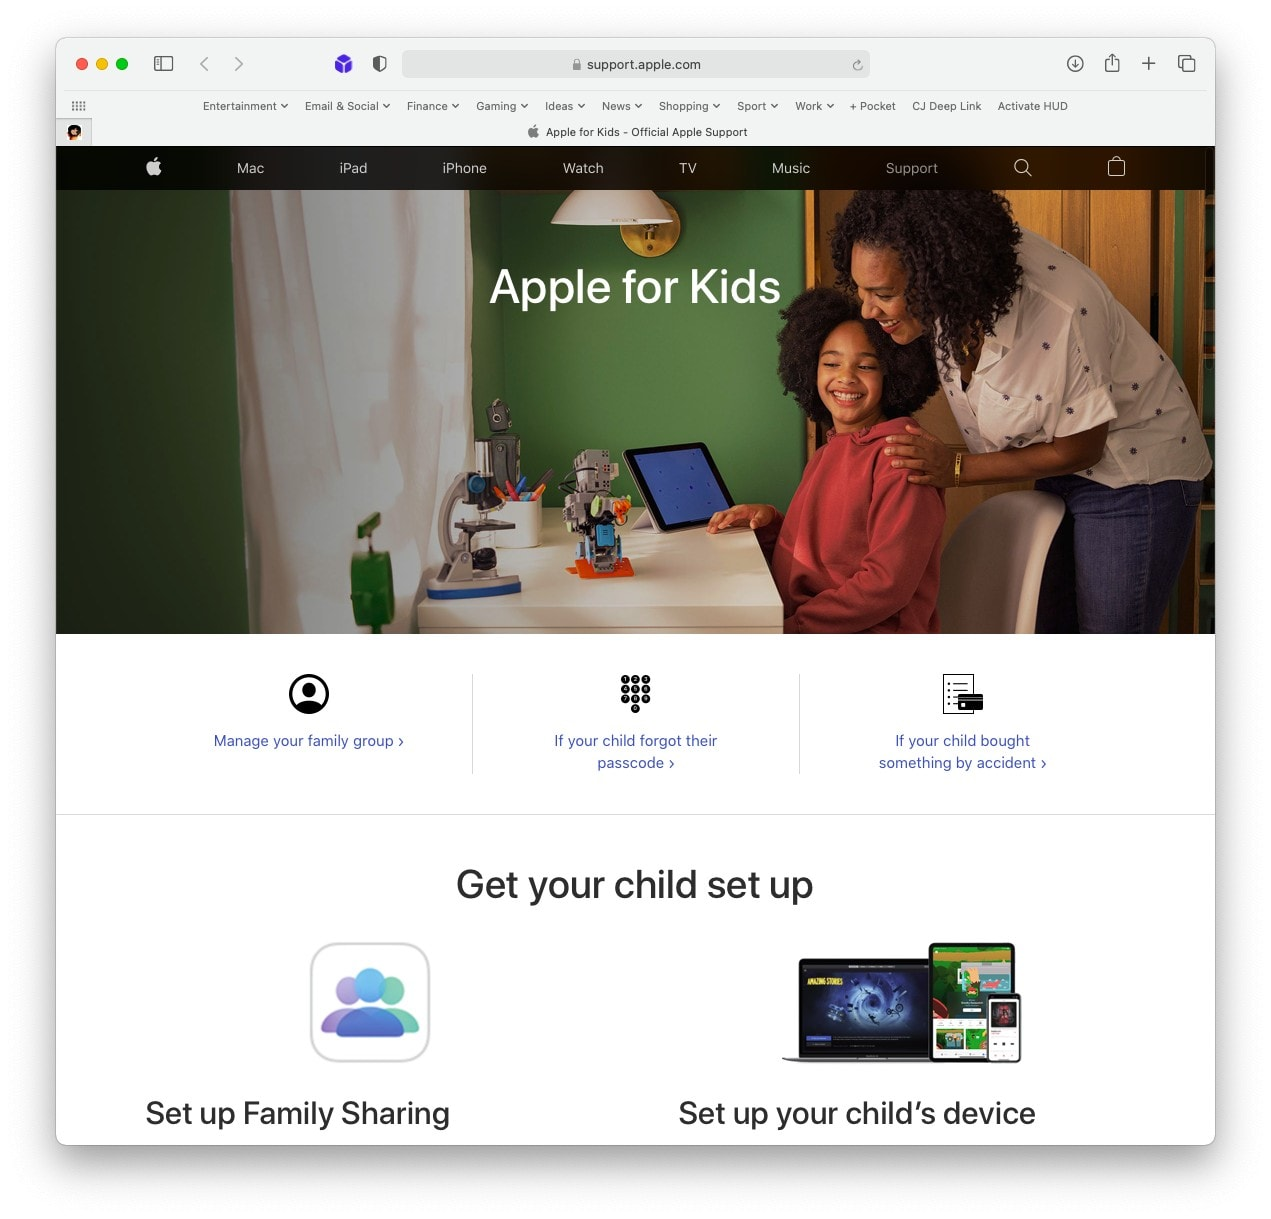 Apple for Kids online portal